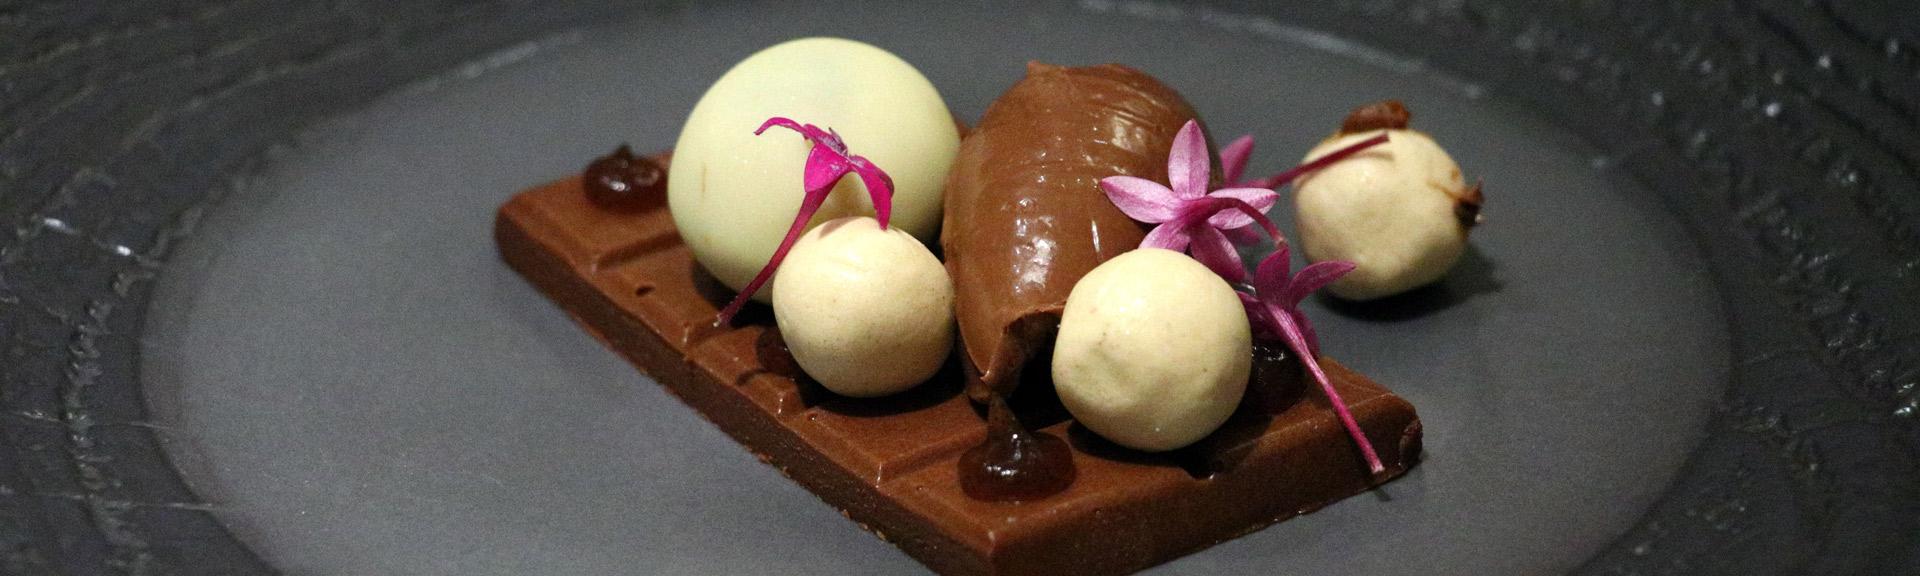 Chocolate Cuisine - La Massana Restaurant in Girona